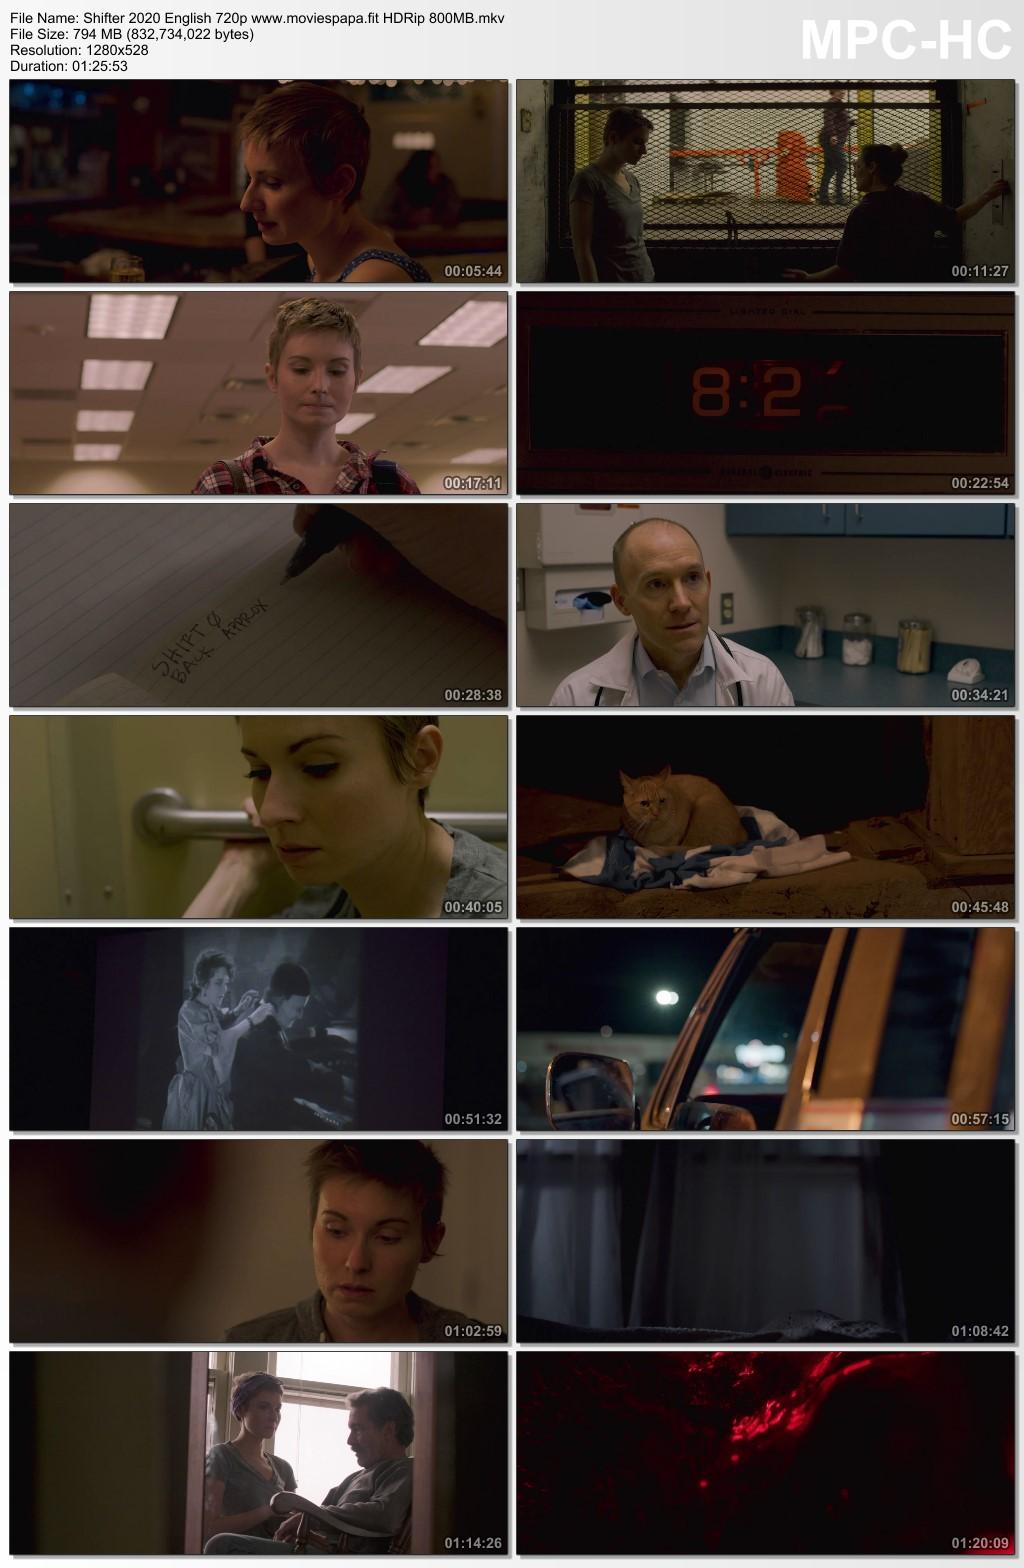 Shifter 2020 English Movie 720p HDRip 850MB Download